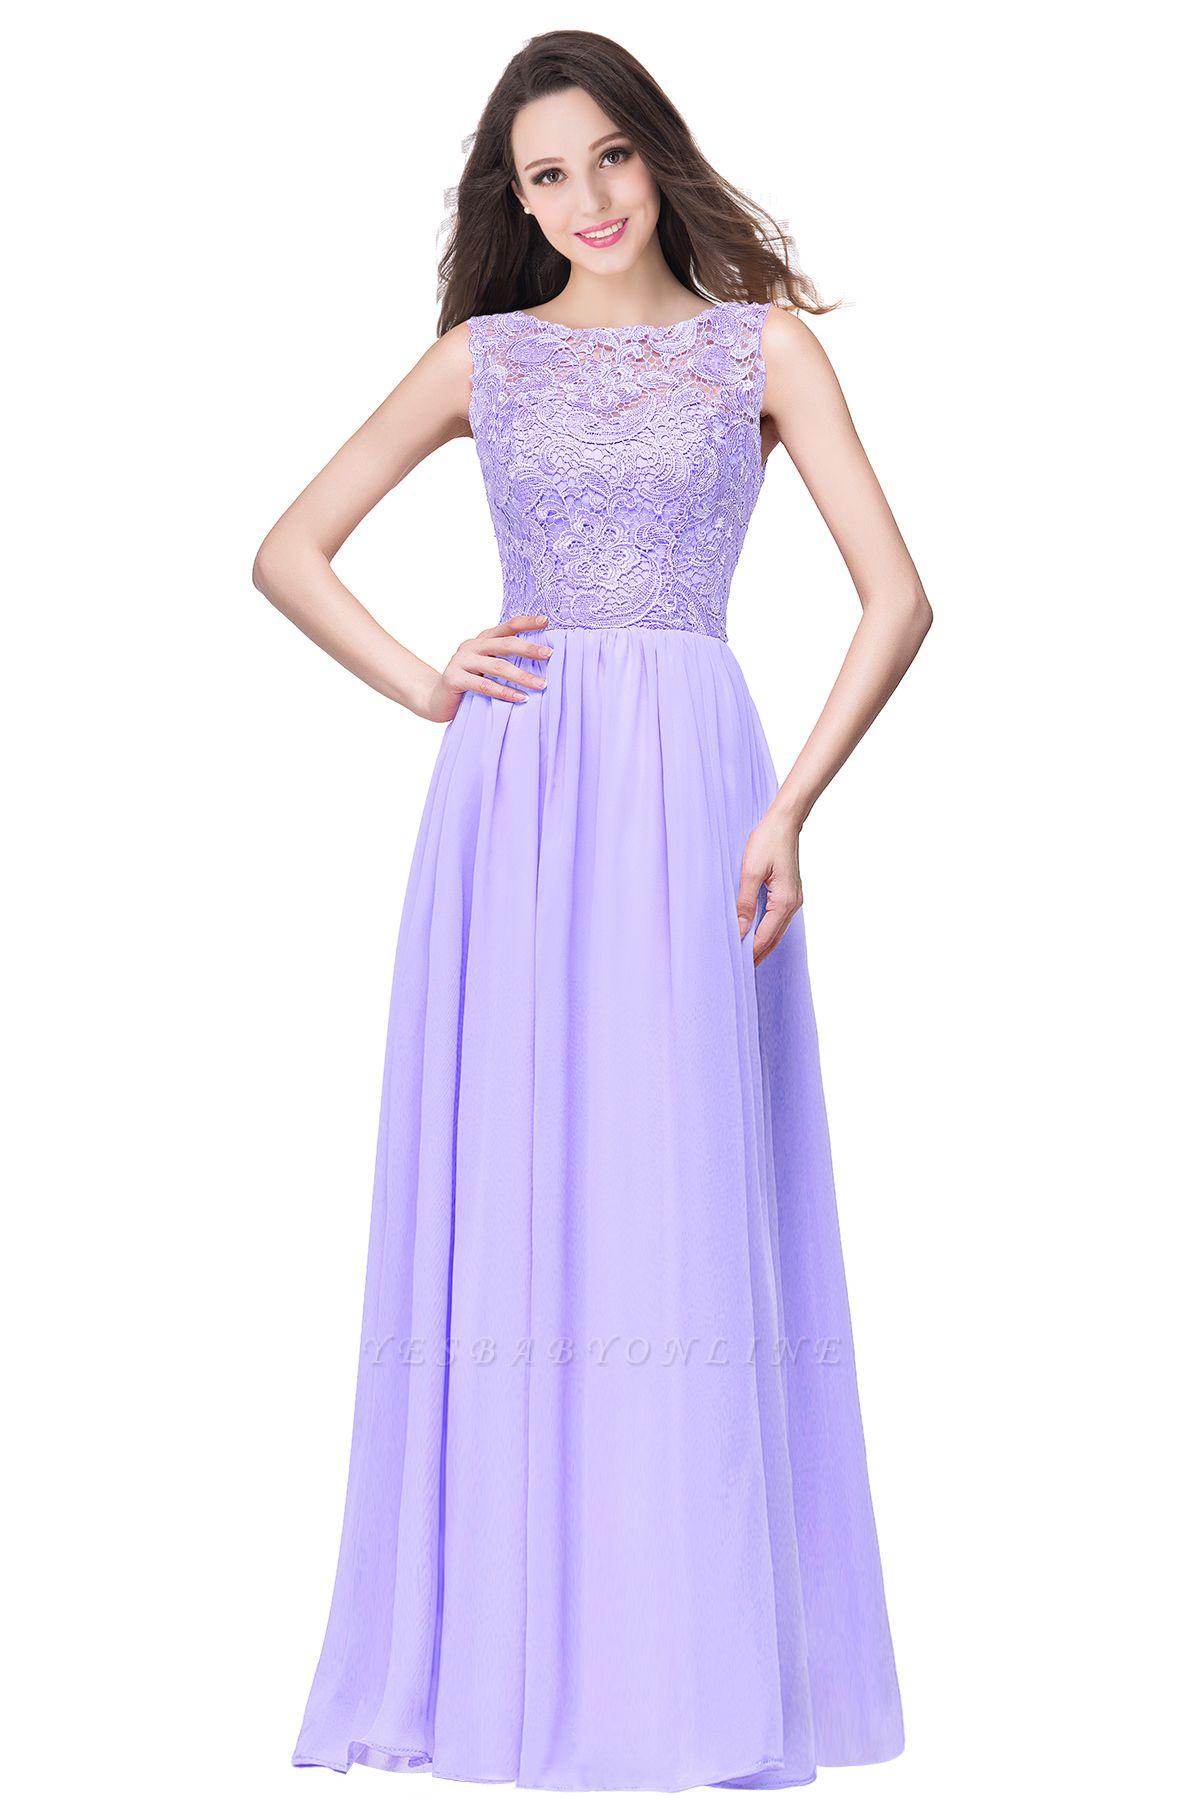 ELYSE   A-line Sleeveless Crew Floor-length Lace Top Chiffon Prom Dresses